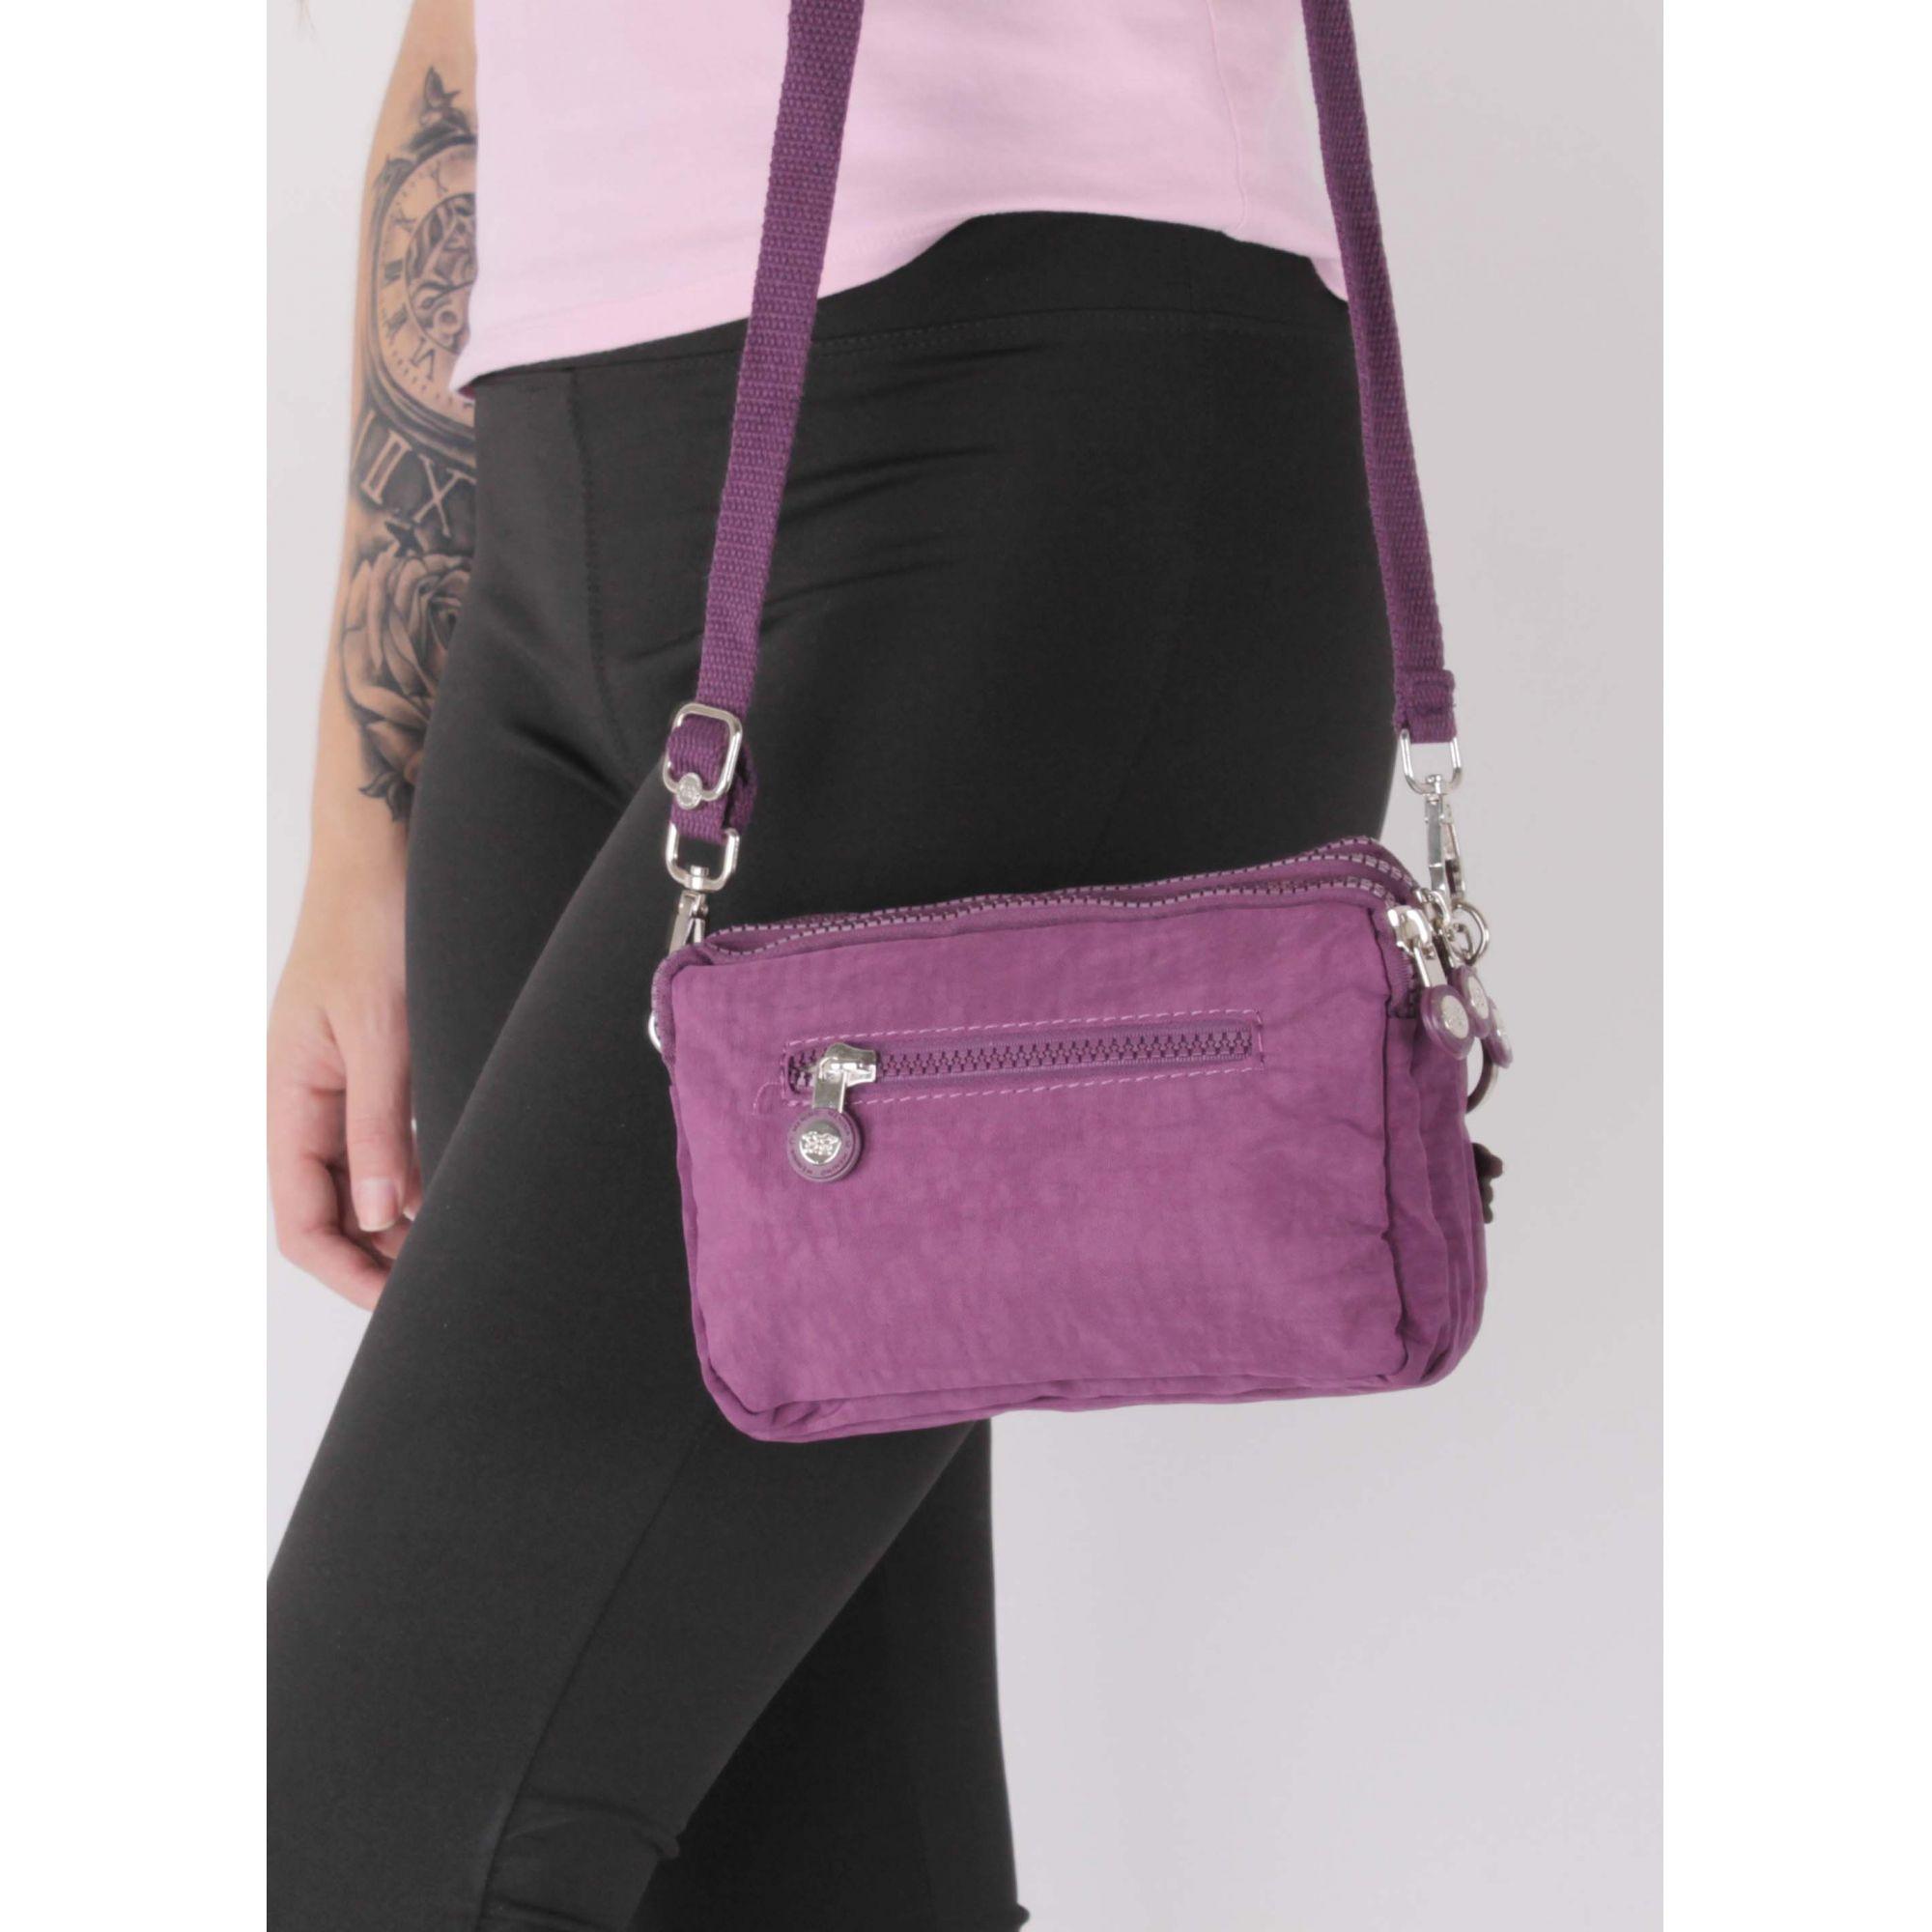 Bolsa Feminina em Nylon HT6003  - Menino_Menina